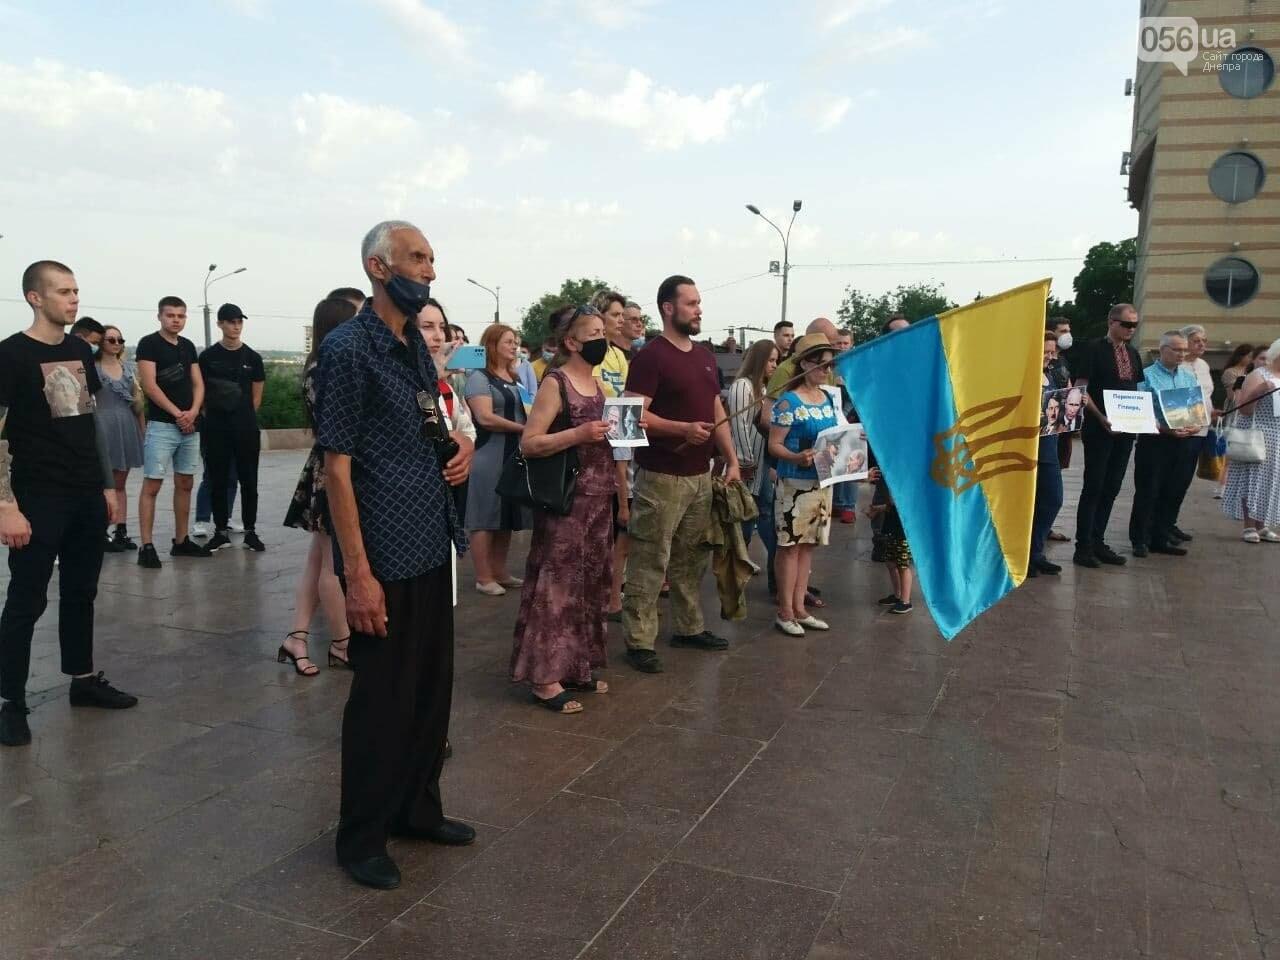 В Днепре активисты заявили, что победят Путина, - ФОТО, ВИДЕО, фото-7